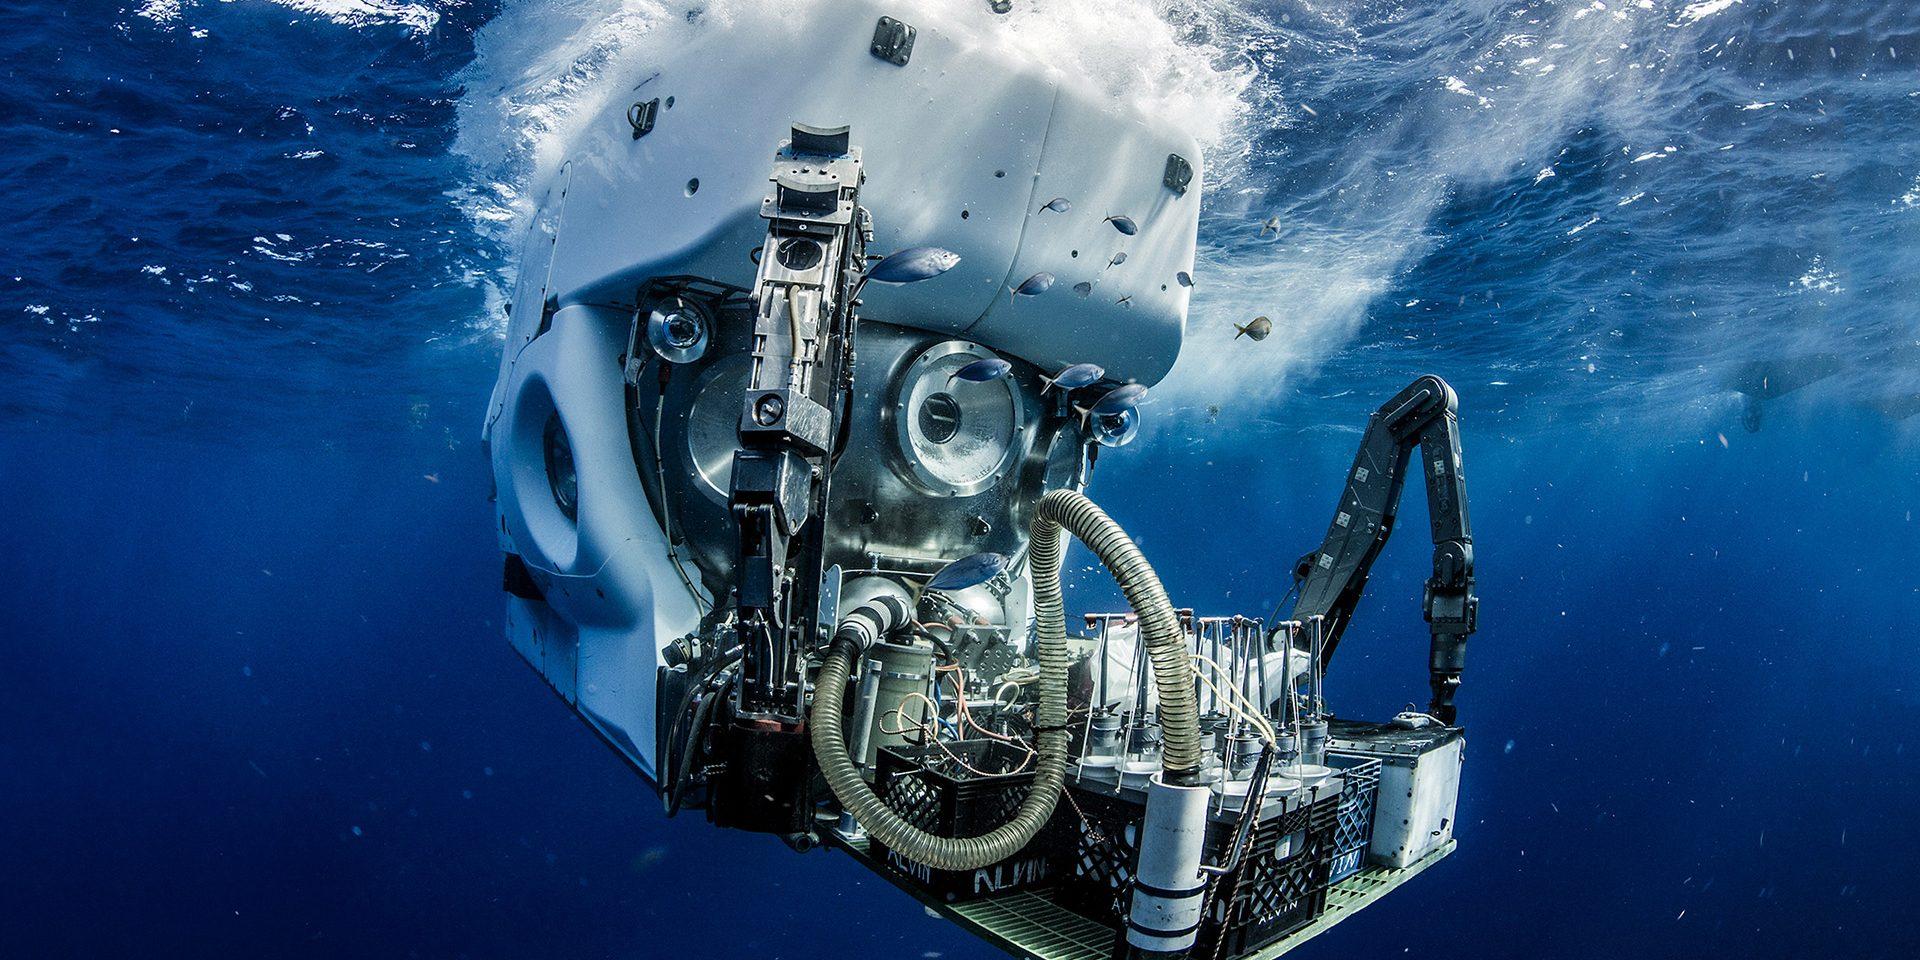 Alvin_underwater